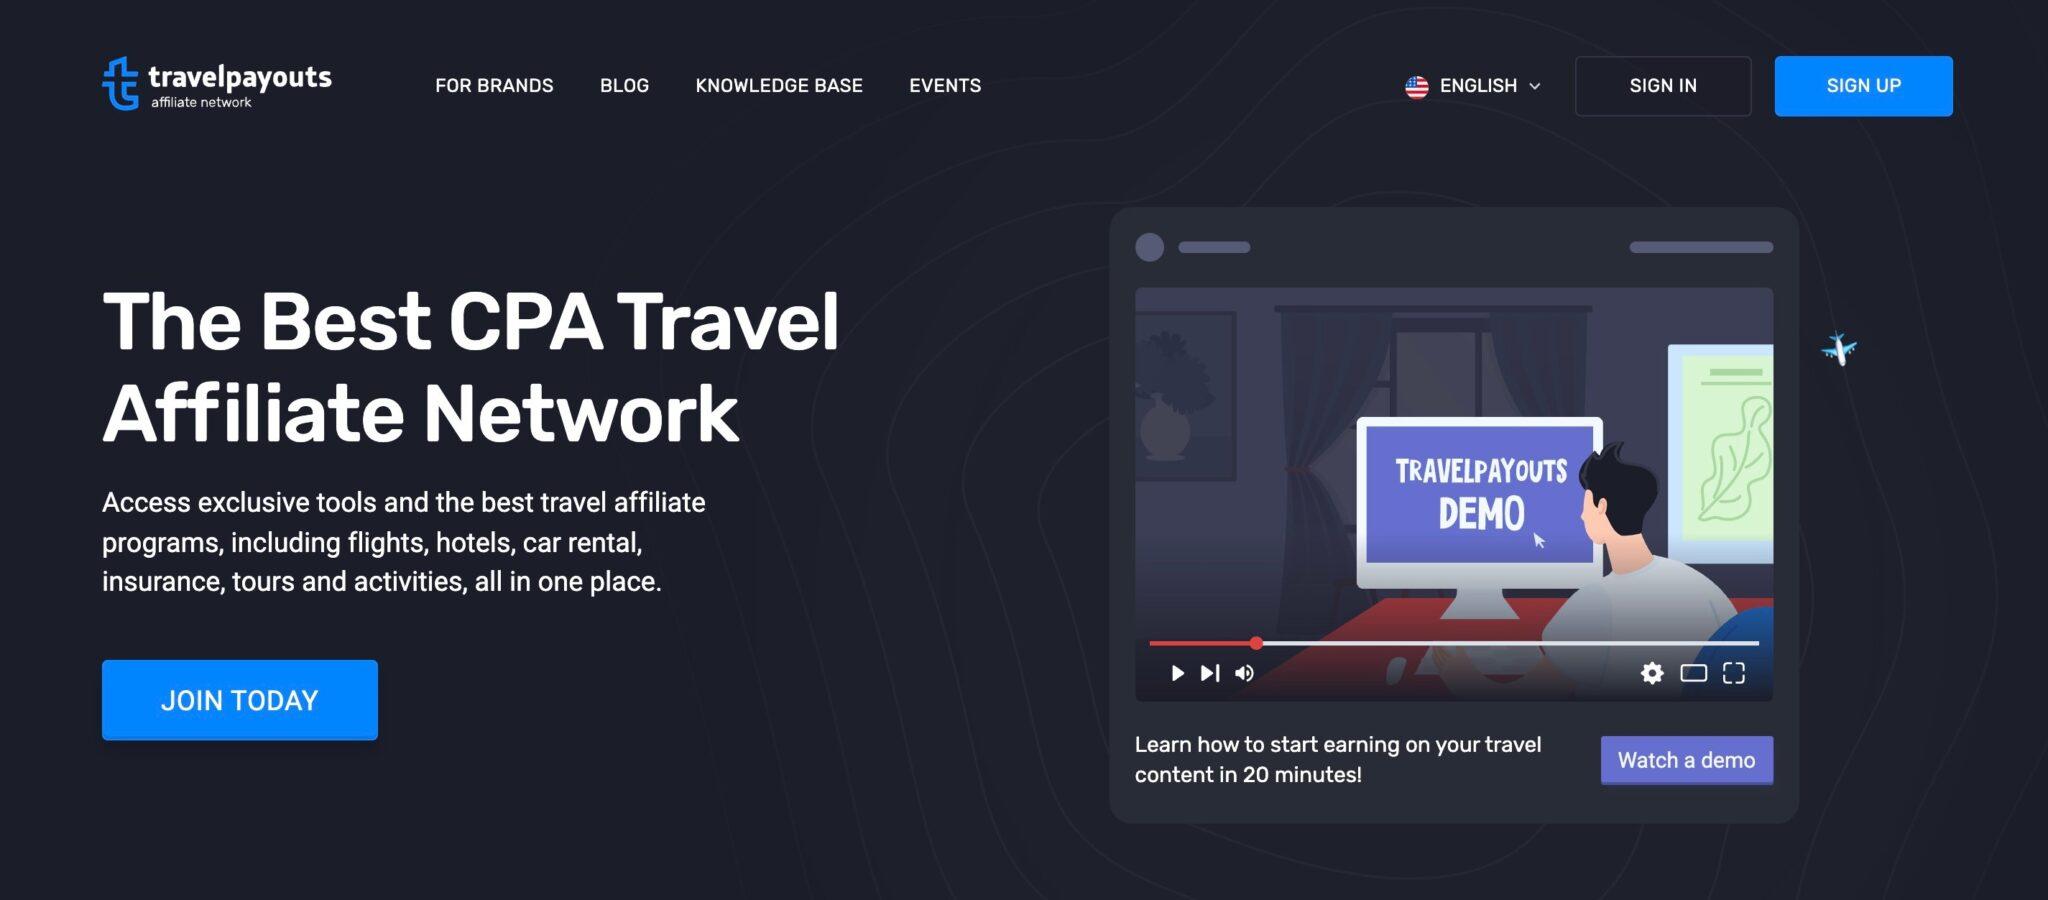 Travel Payouts affiliate program